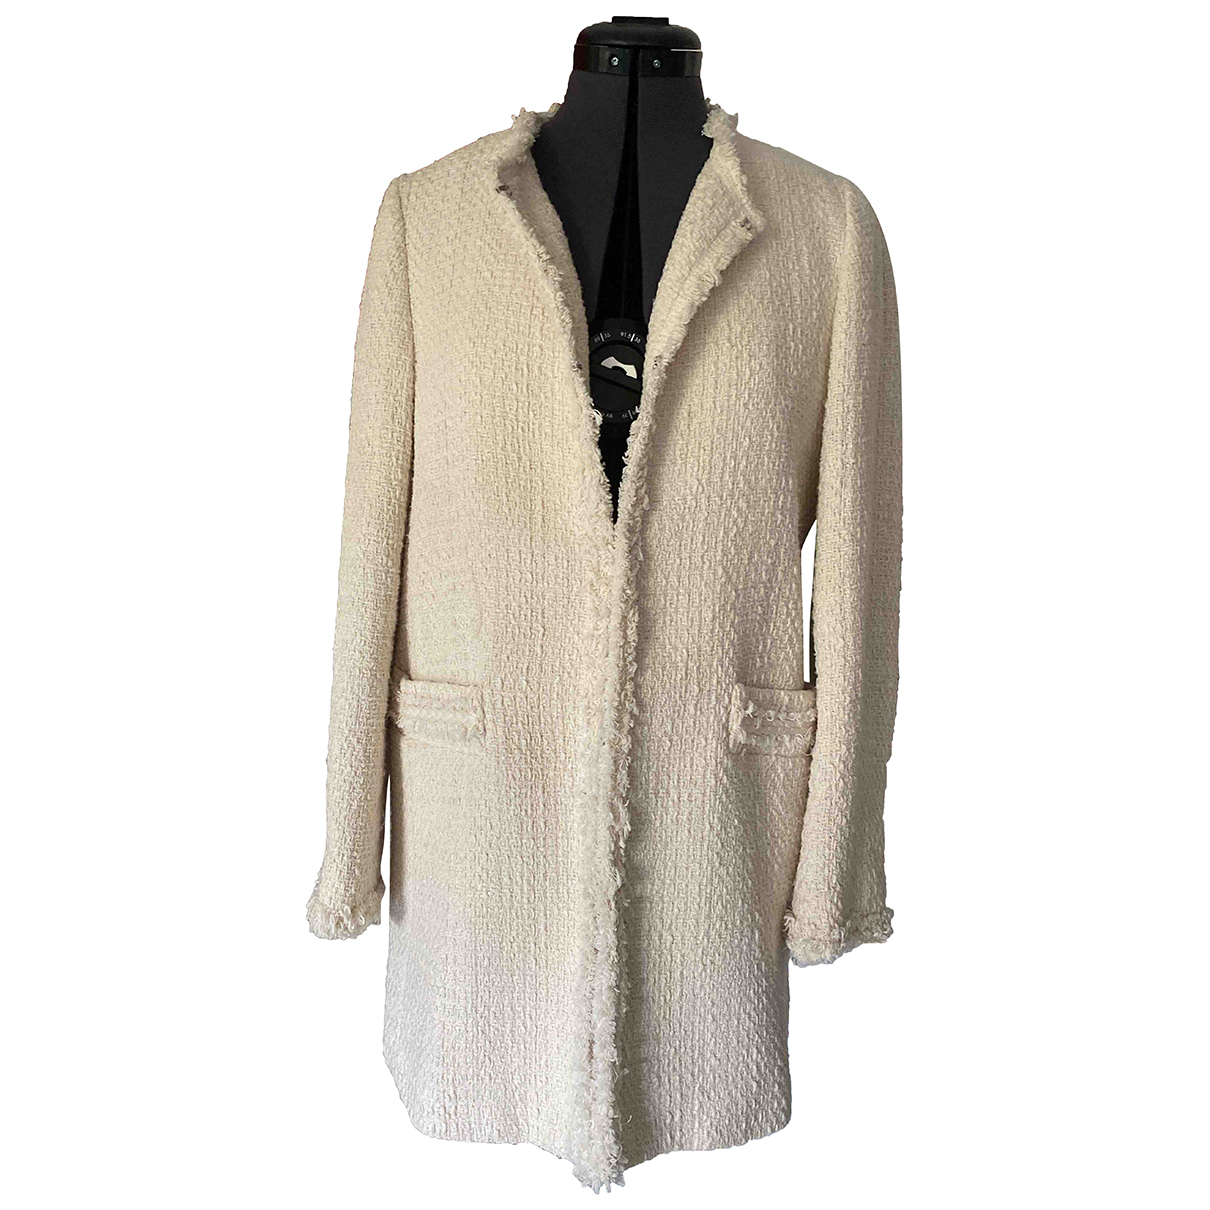 Zara N Ecru Cotton jacket for Women M International